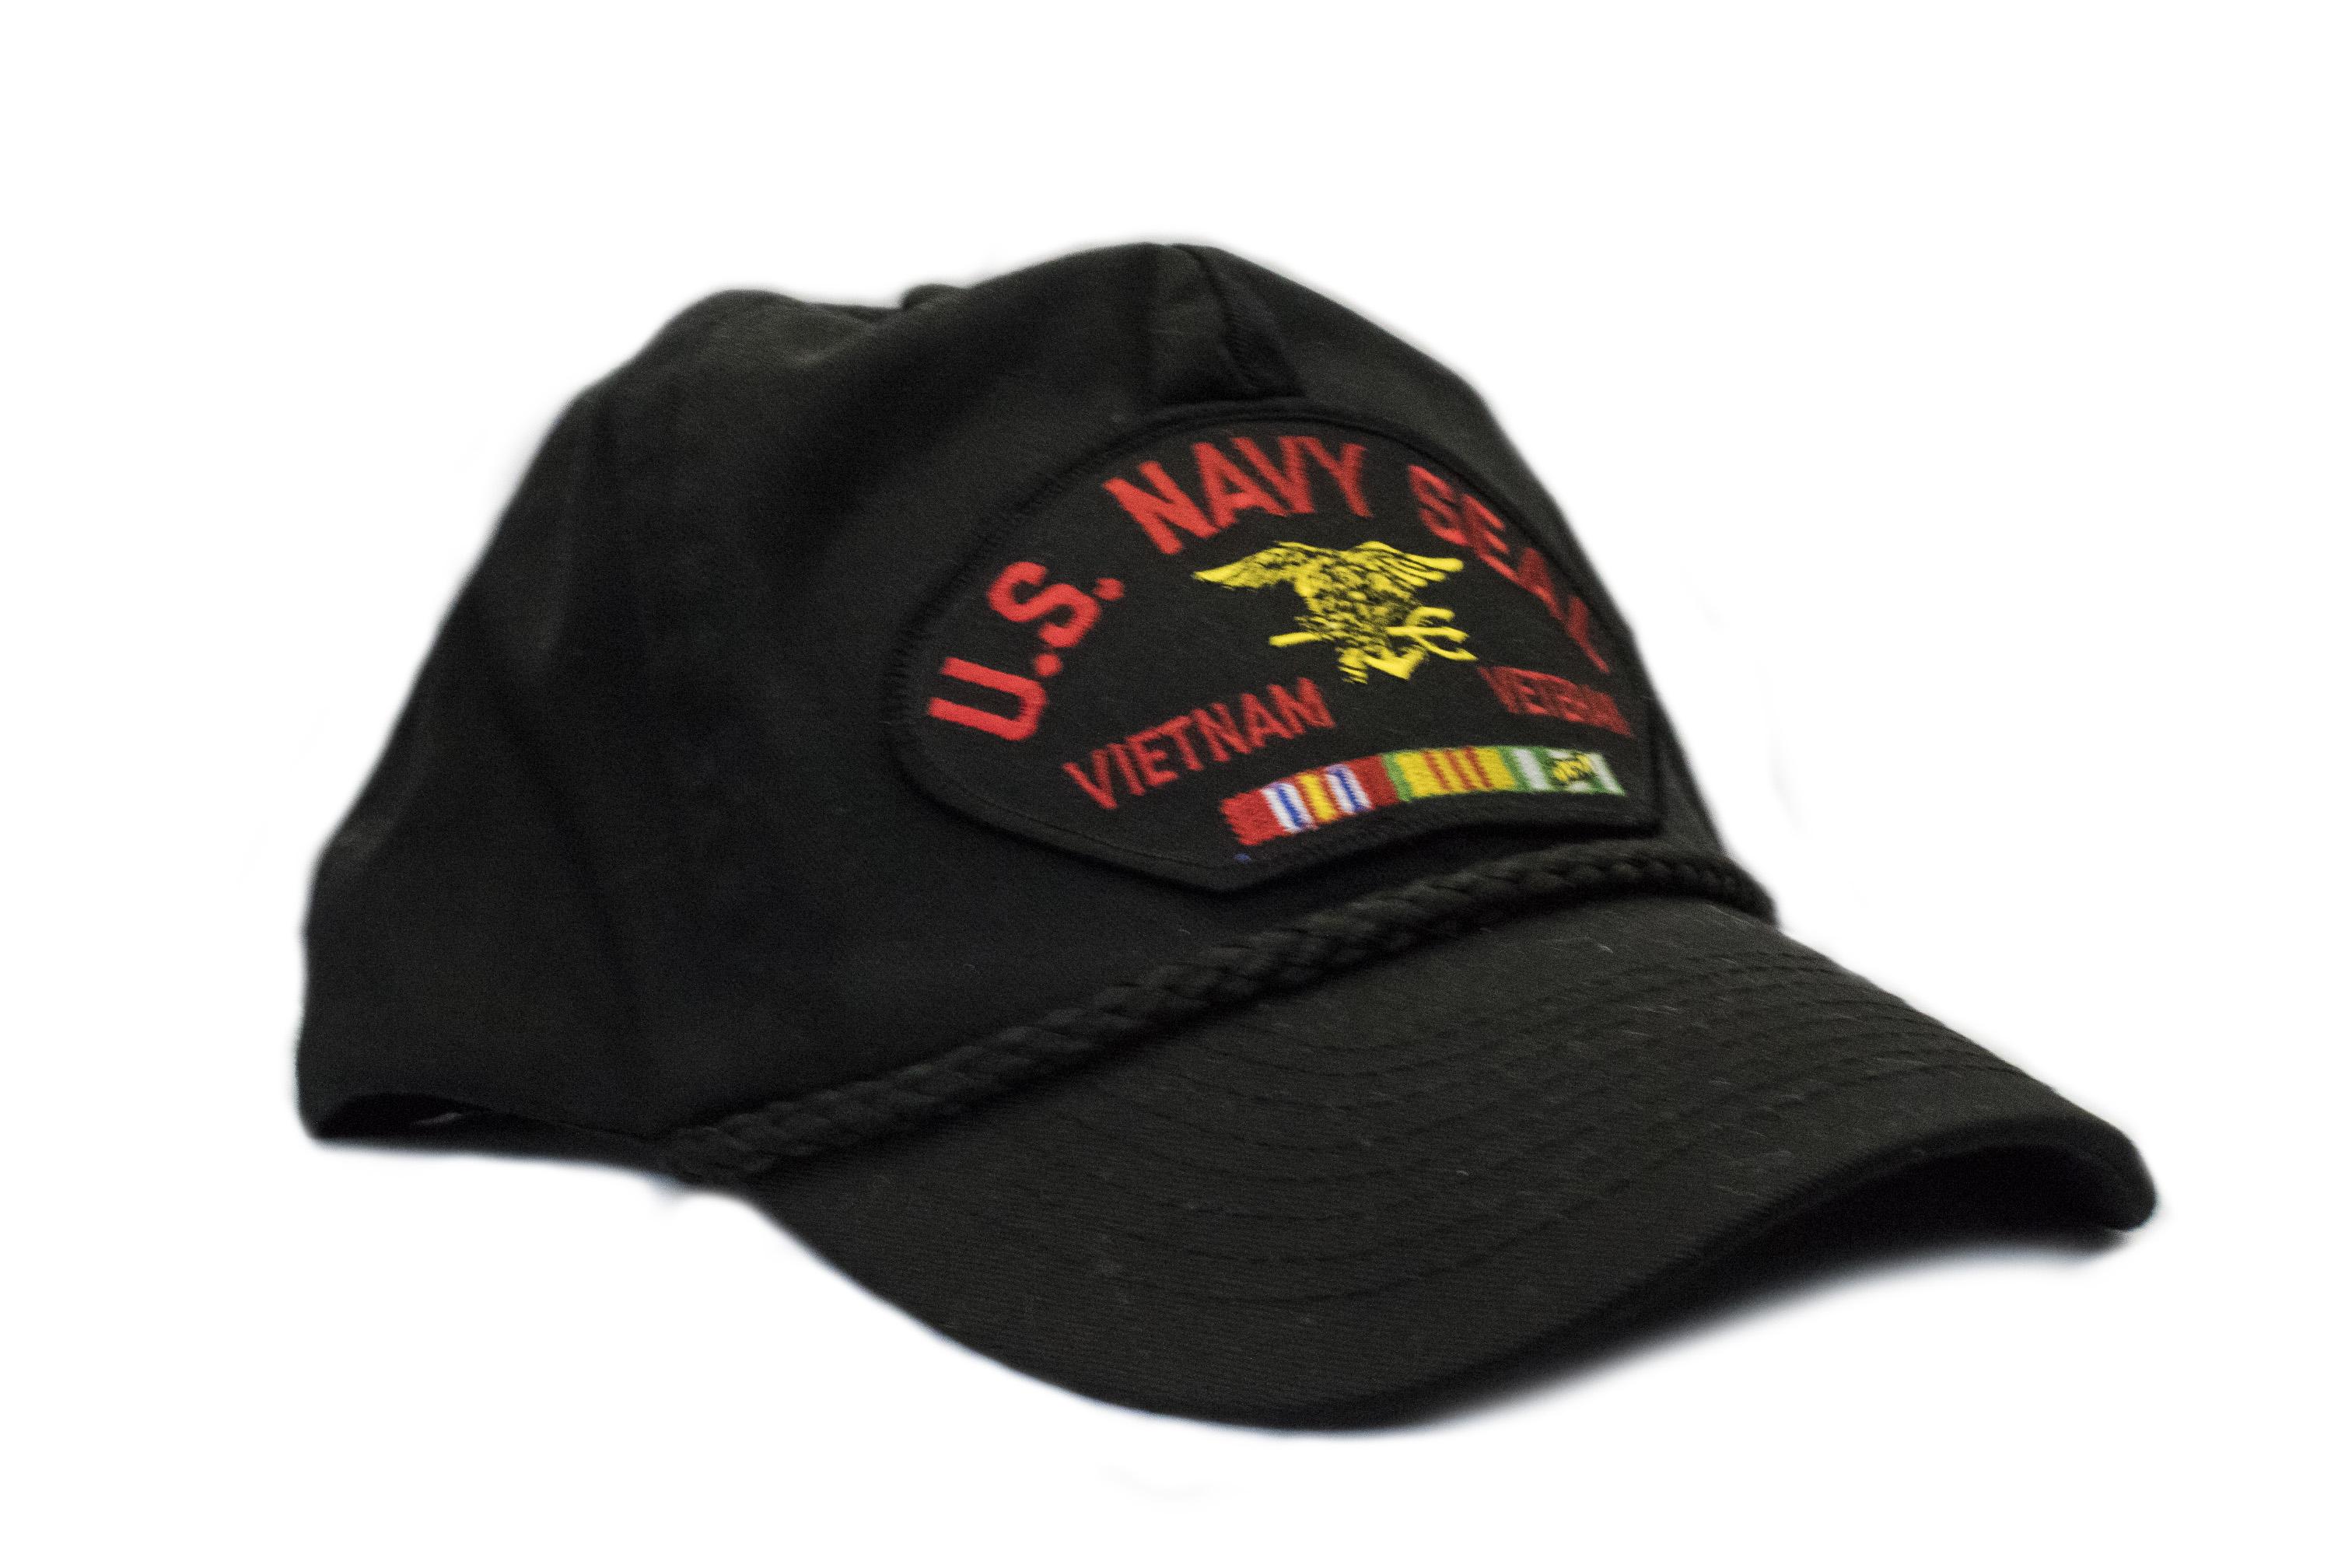 37f5f98e0 U.S. Navy Seal Vietnam Veteran Hat